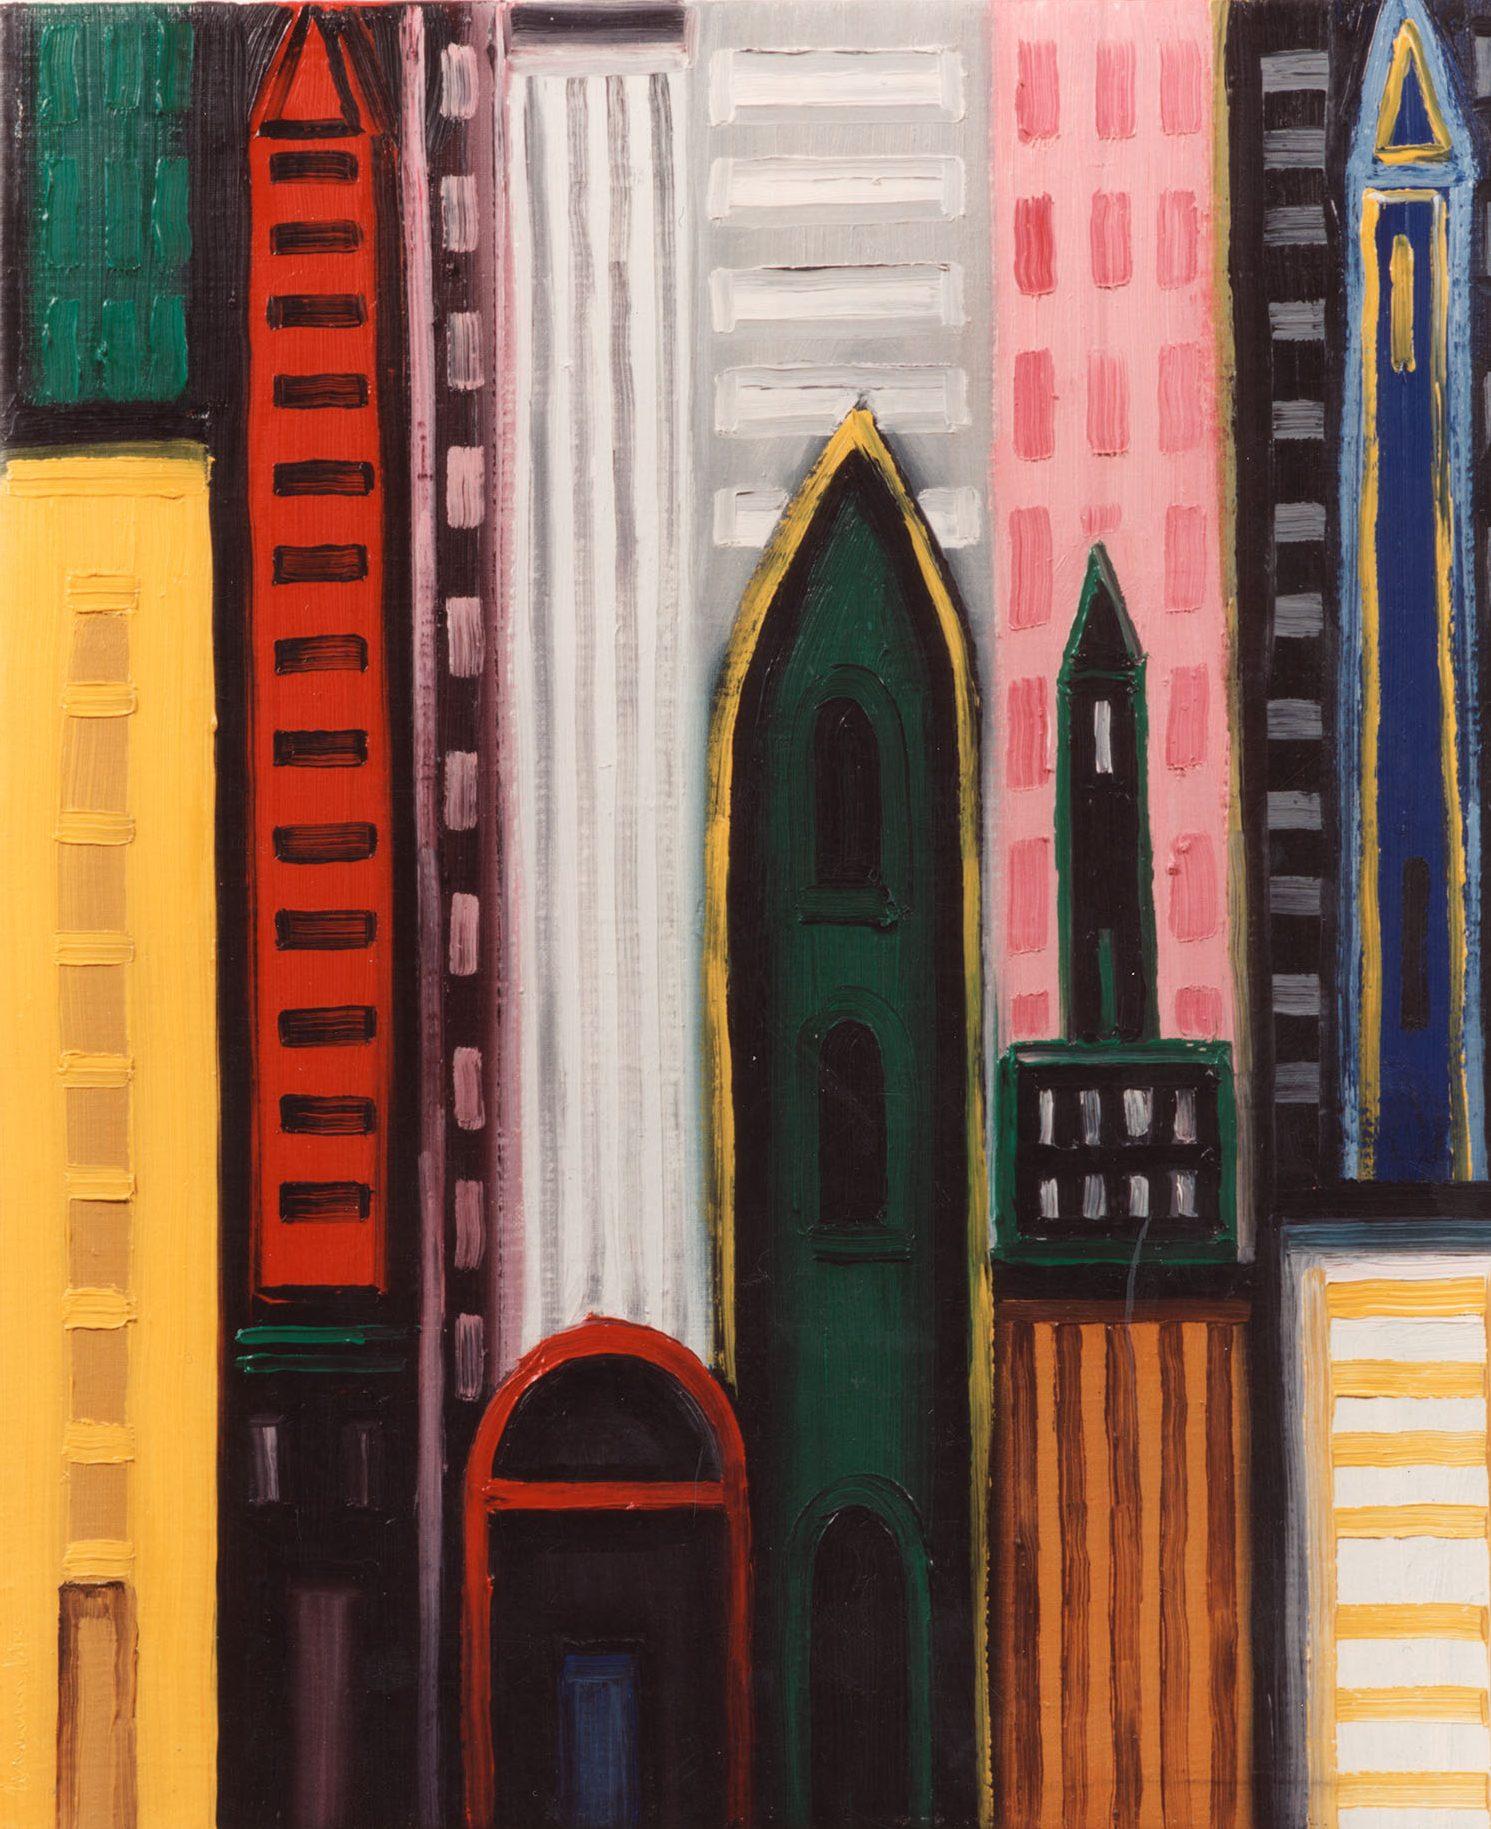 New York, 1992, oli sobre tela, cm 55 x 46